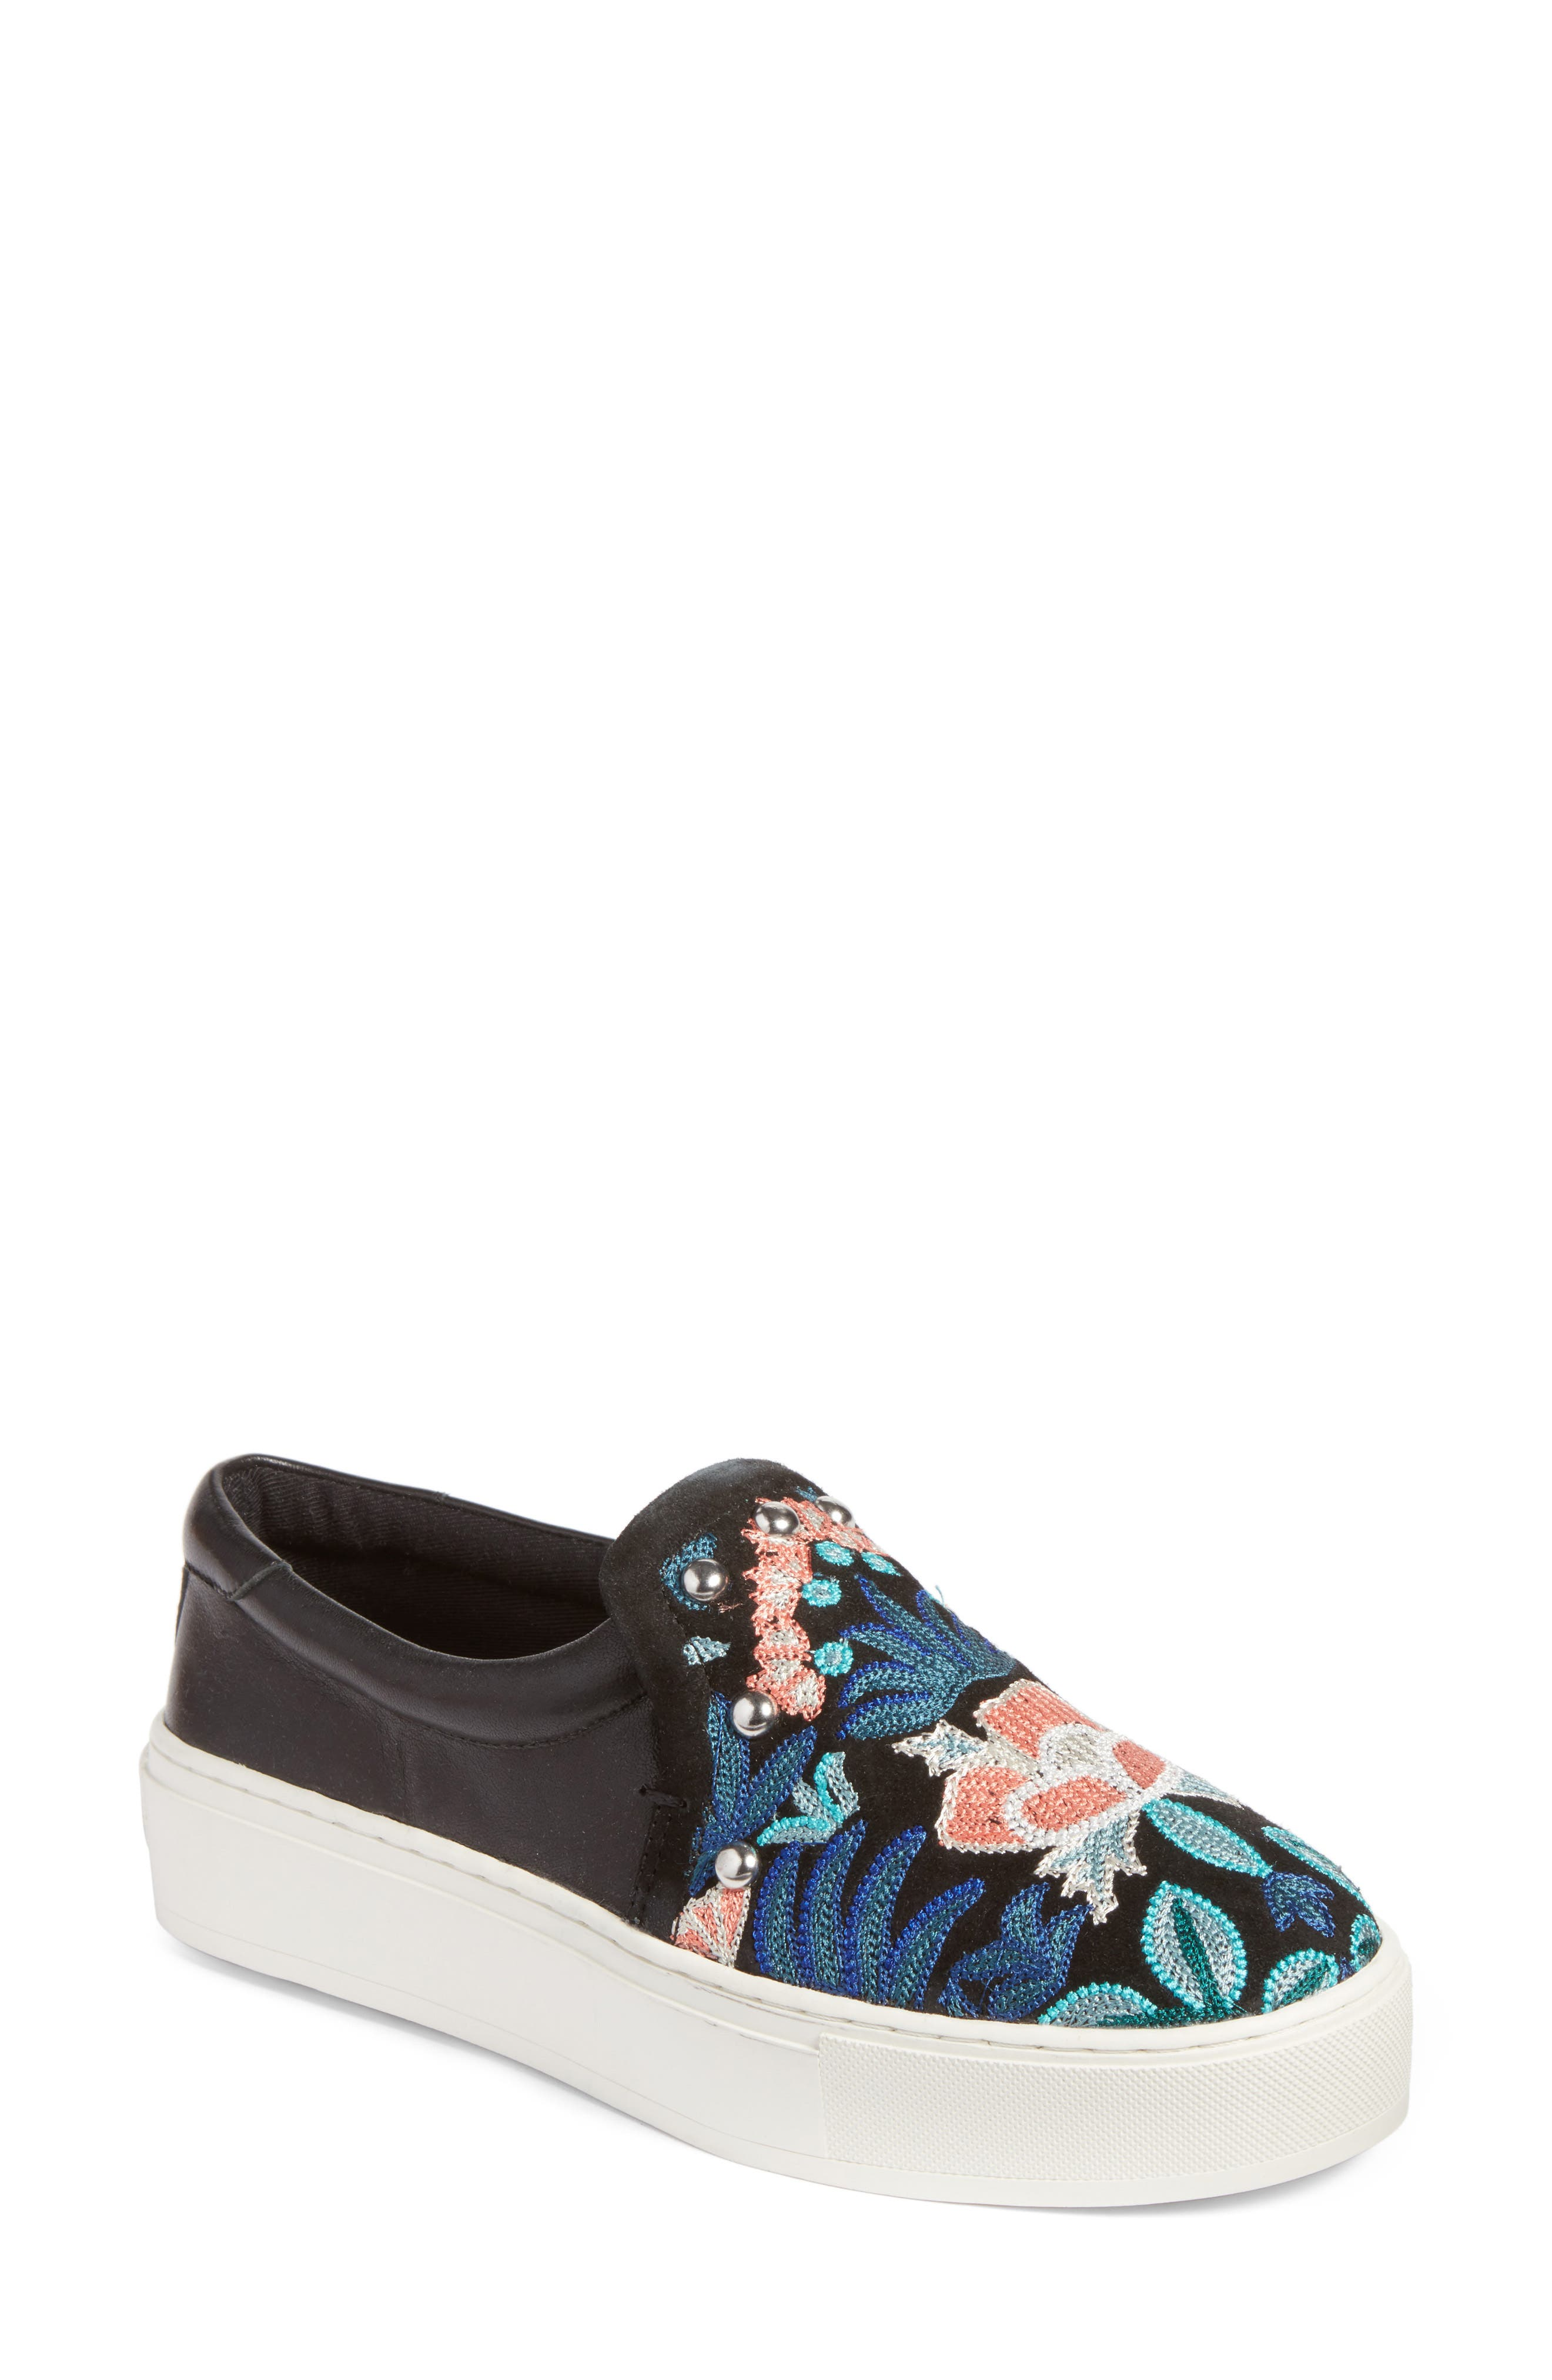 Main Image - Rebecca Minkoff Noelle Embellished Slip-On Platform Sneaker (Women)